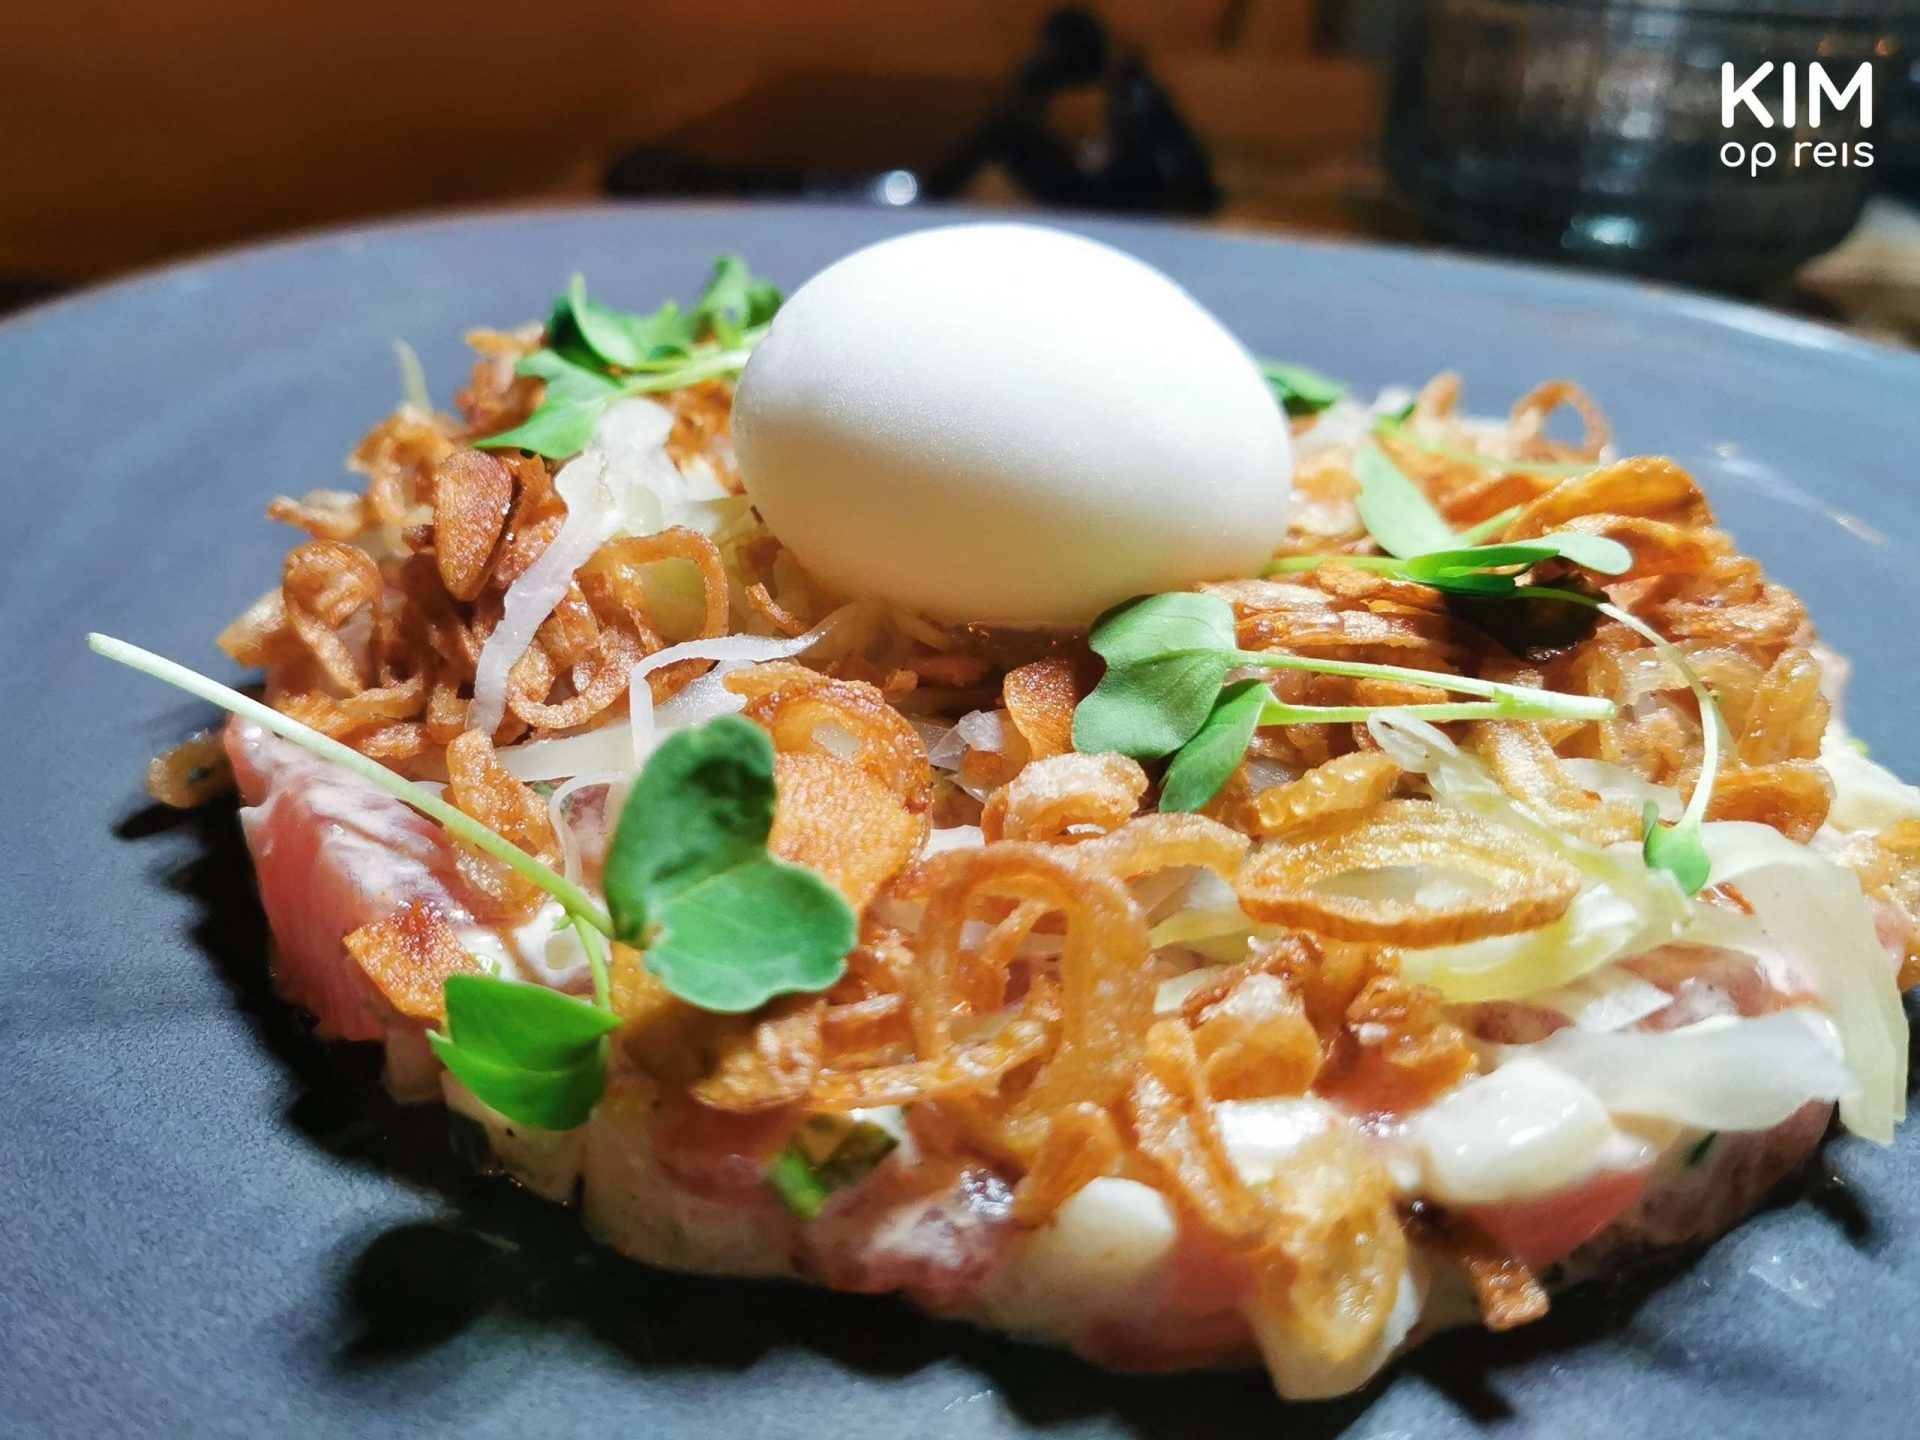 Restaurant Mosa tartare Curaçao: tuna tartare with an egg on top